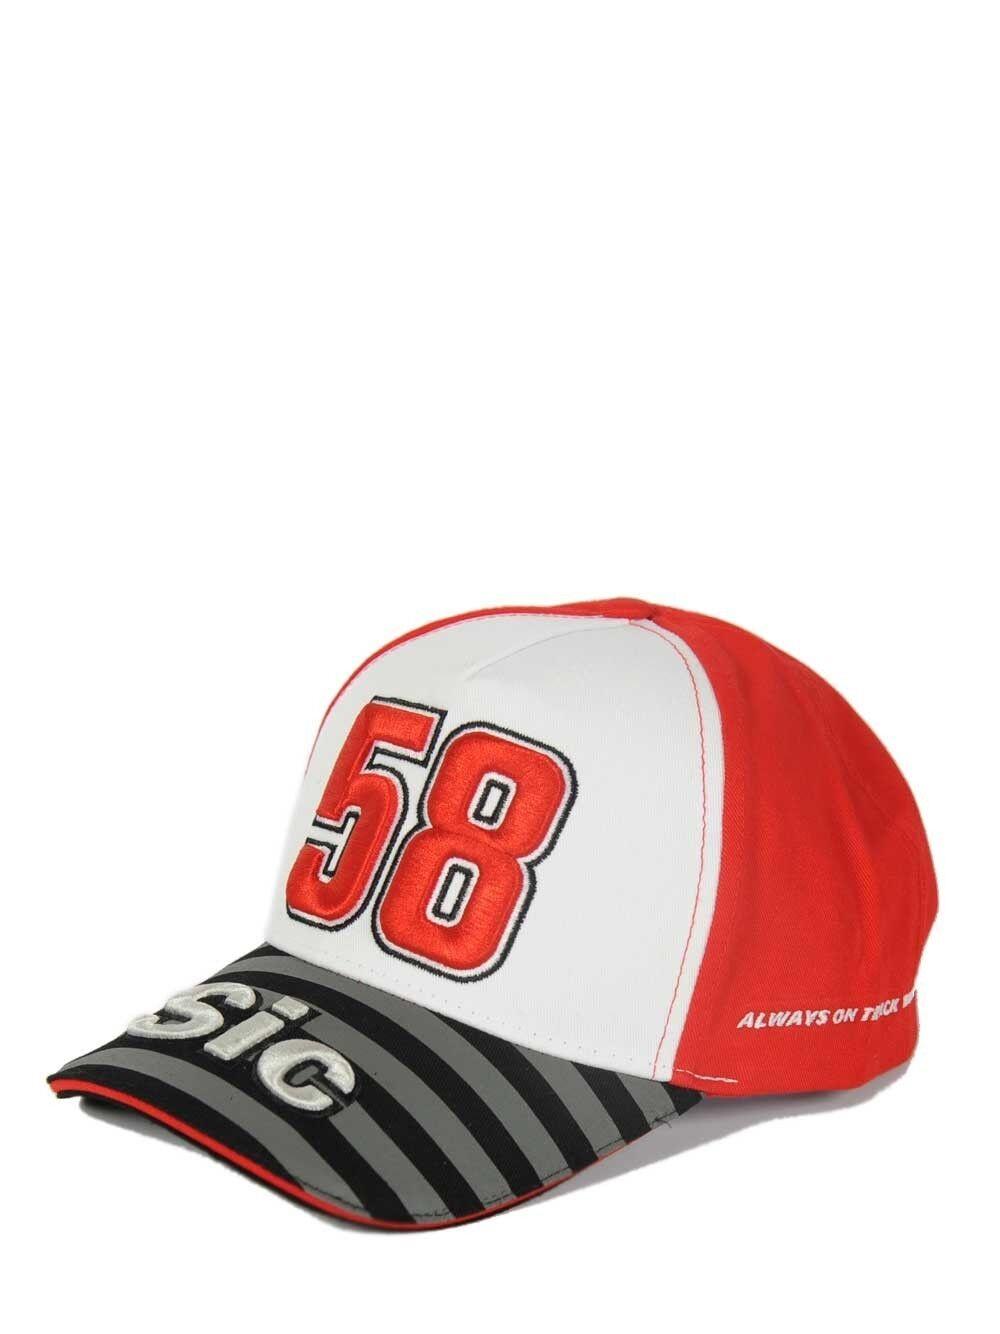 2016 Official SuperSic 58 Cap - 16 45003